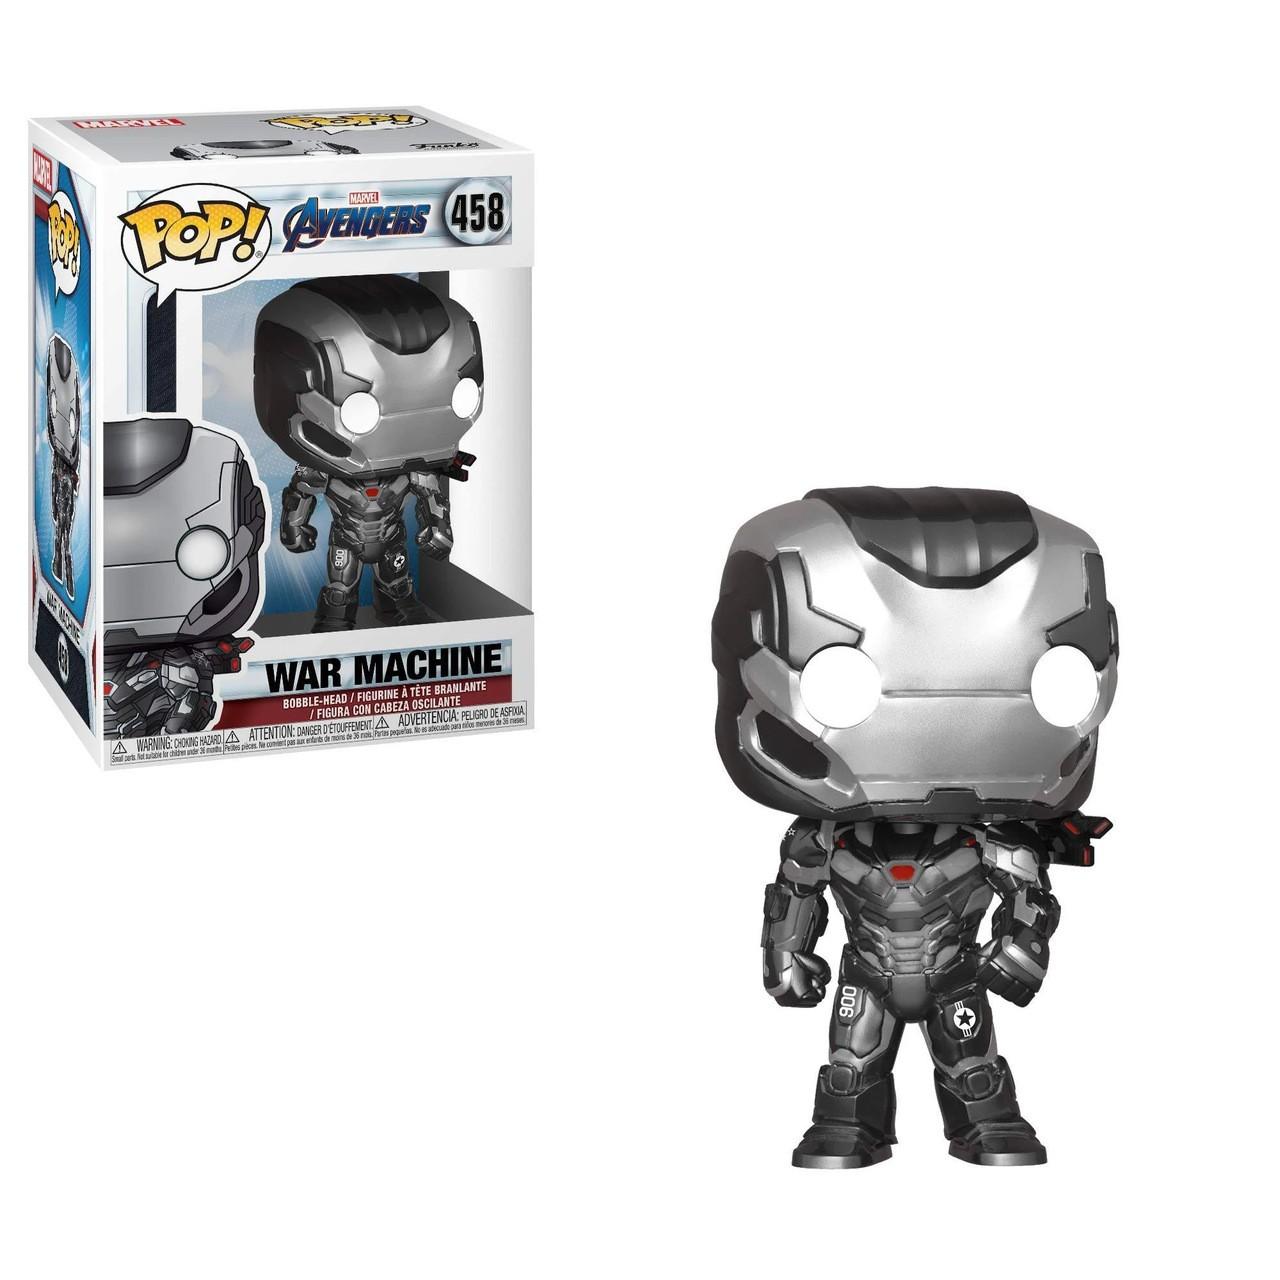 Boneco Funko Pop War Machine 458 - Vingadores Endgame Marvel